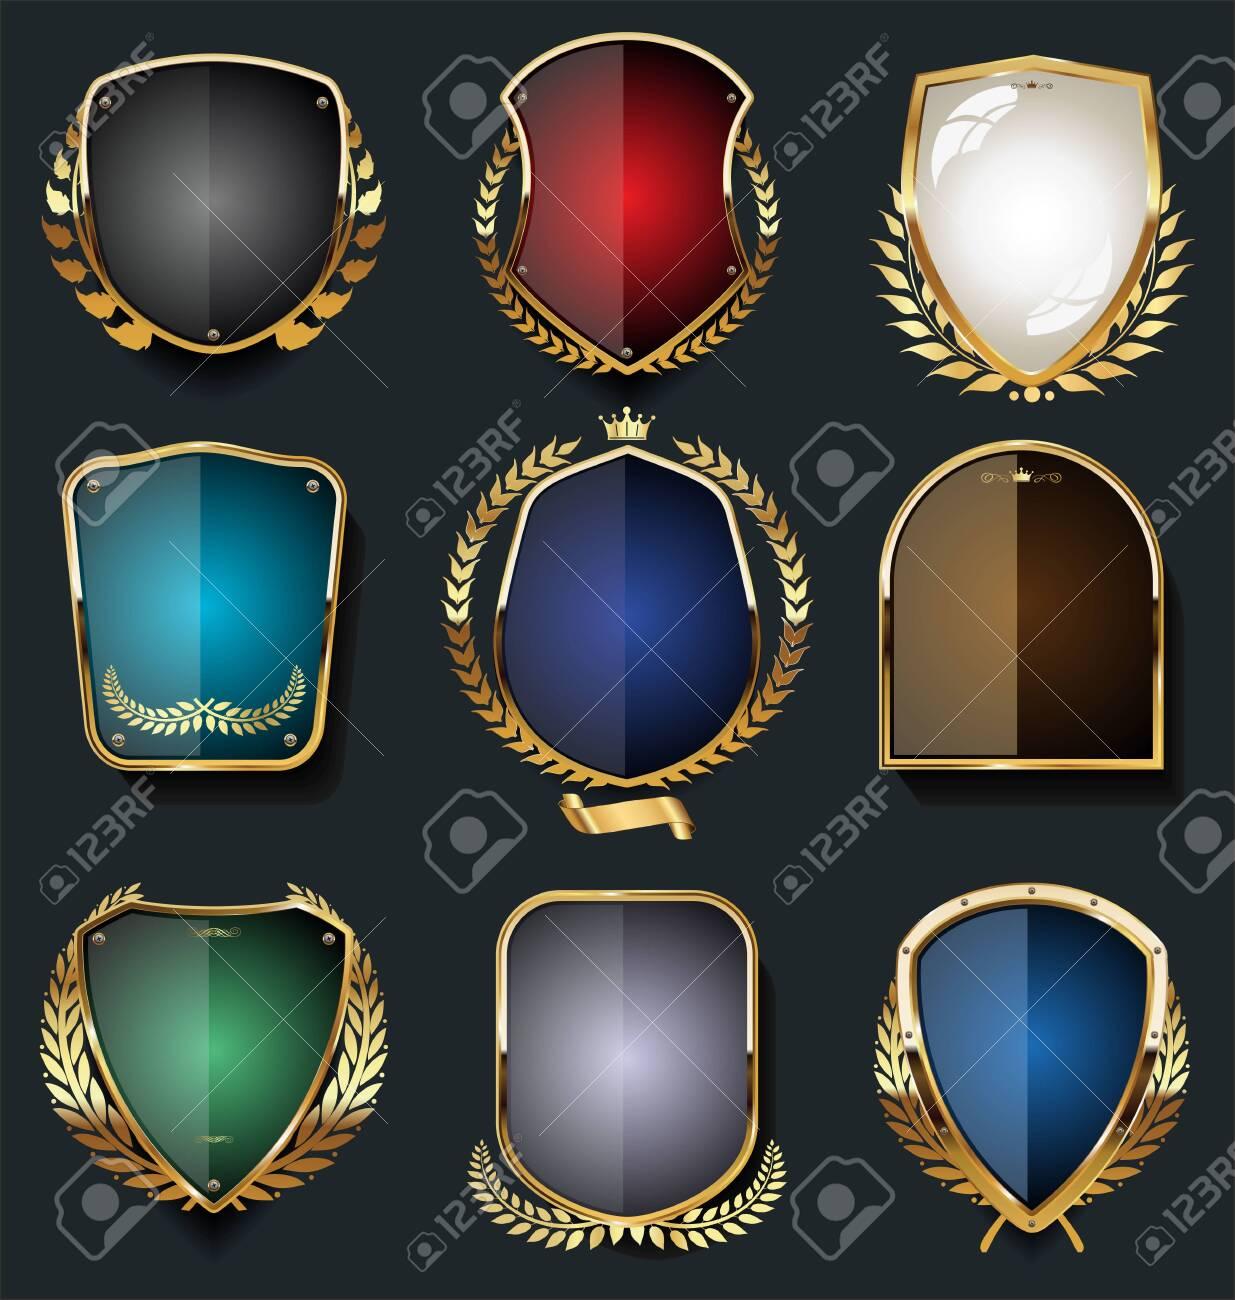 Luxury premium golden badges and labels - 131079046